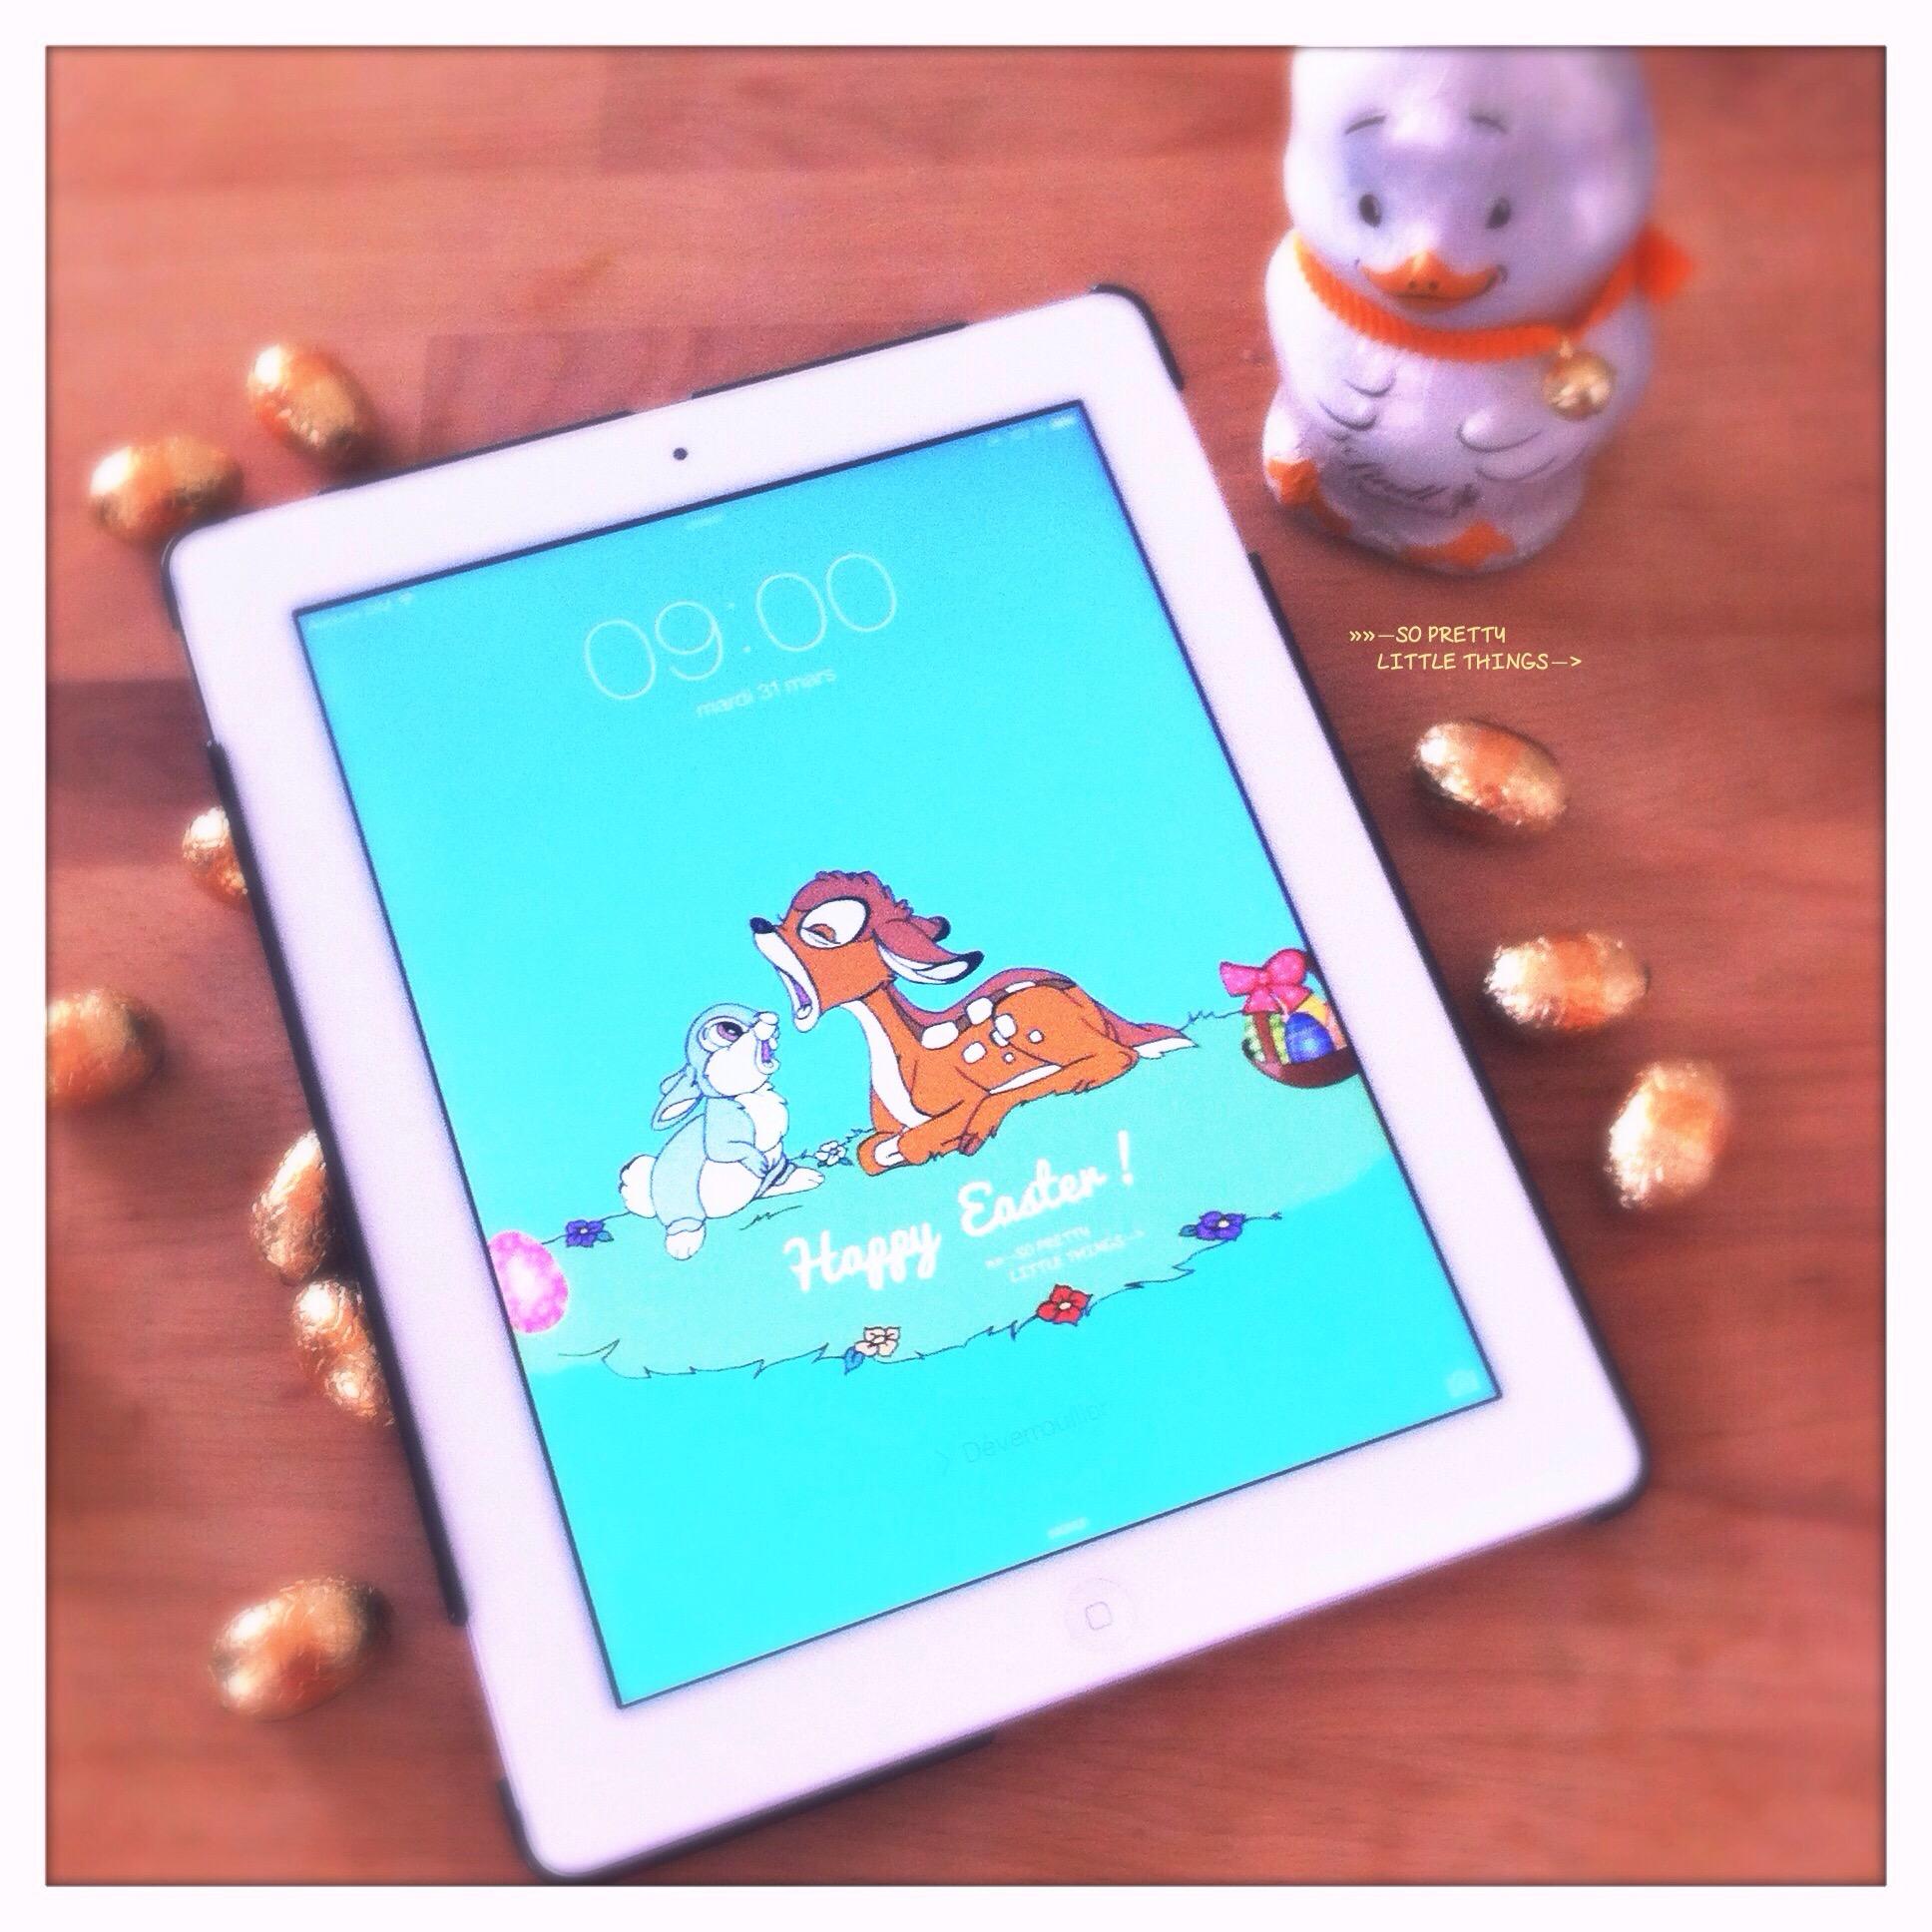 Fond d'écran, wallpaper Bambi et Panpan. Easter